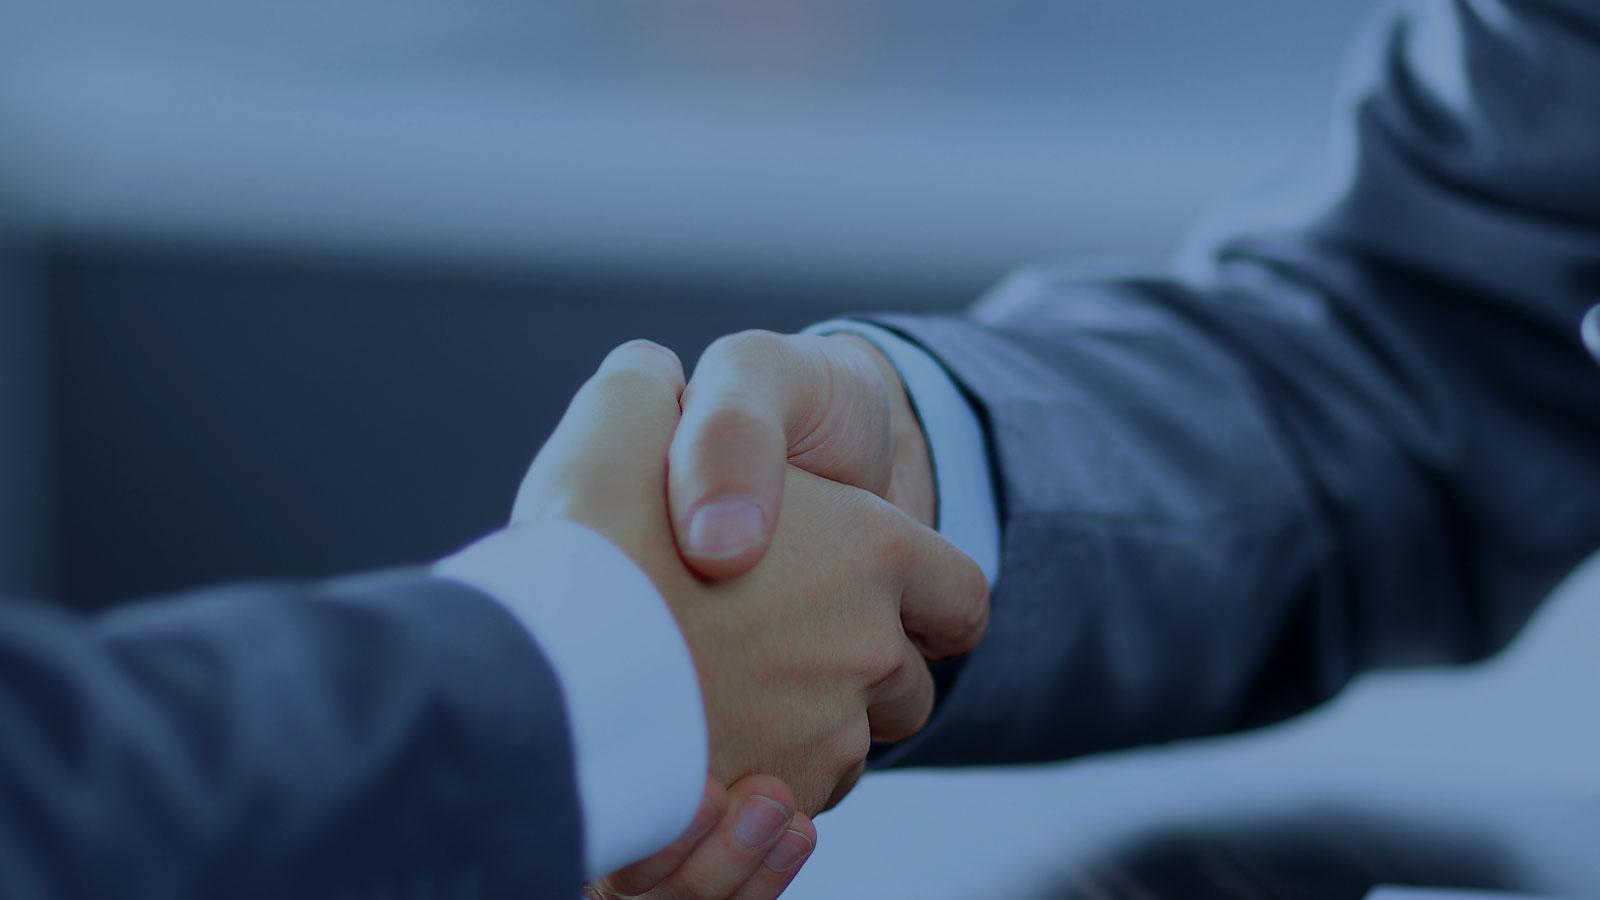 Langston Commercial Real Estate Slider Relationships Matter Slider